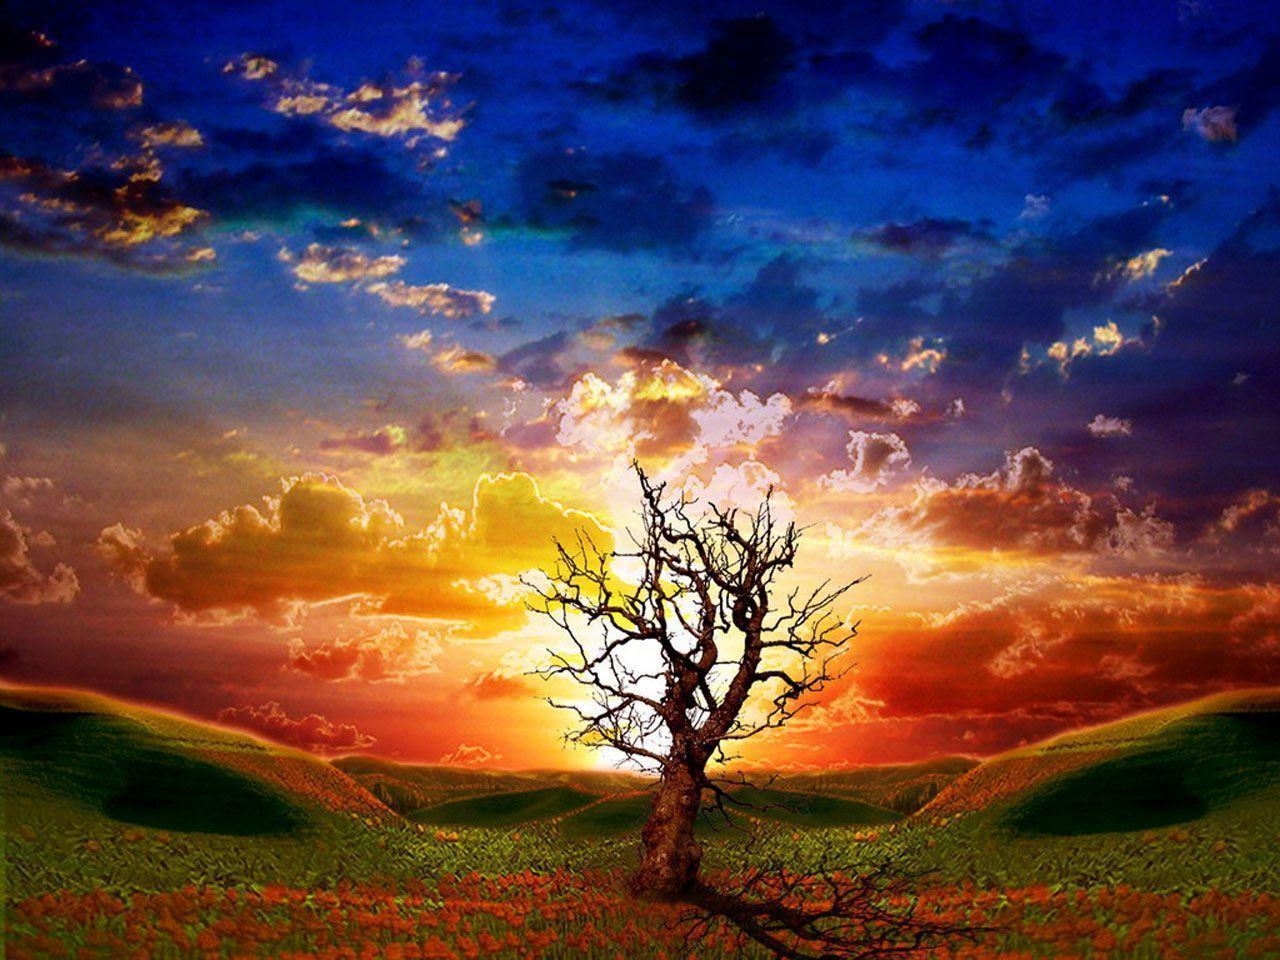 3D Nature Wallpaper Hd Background Wallpaper 50 HD Wallpapers ...